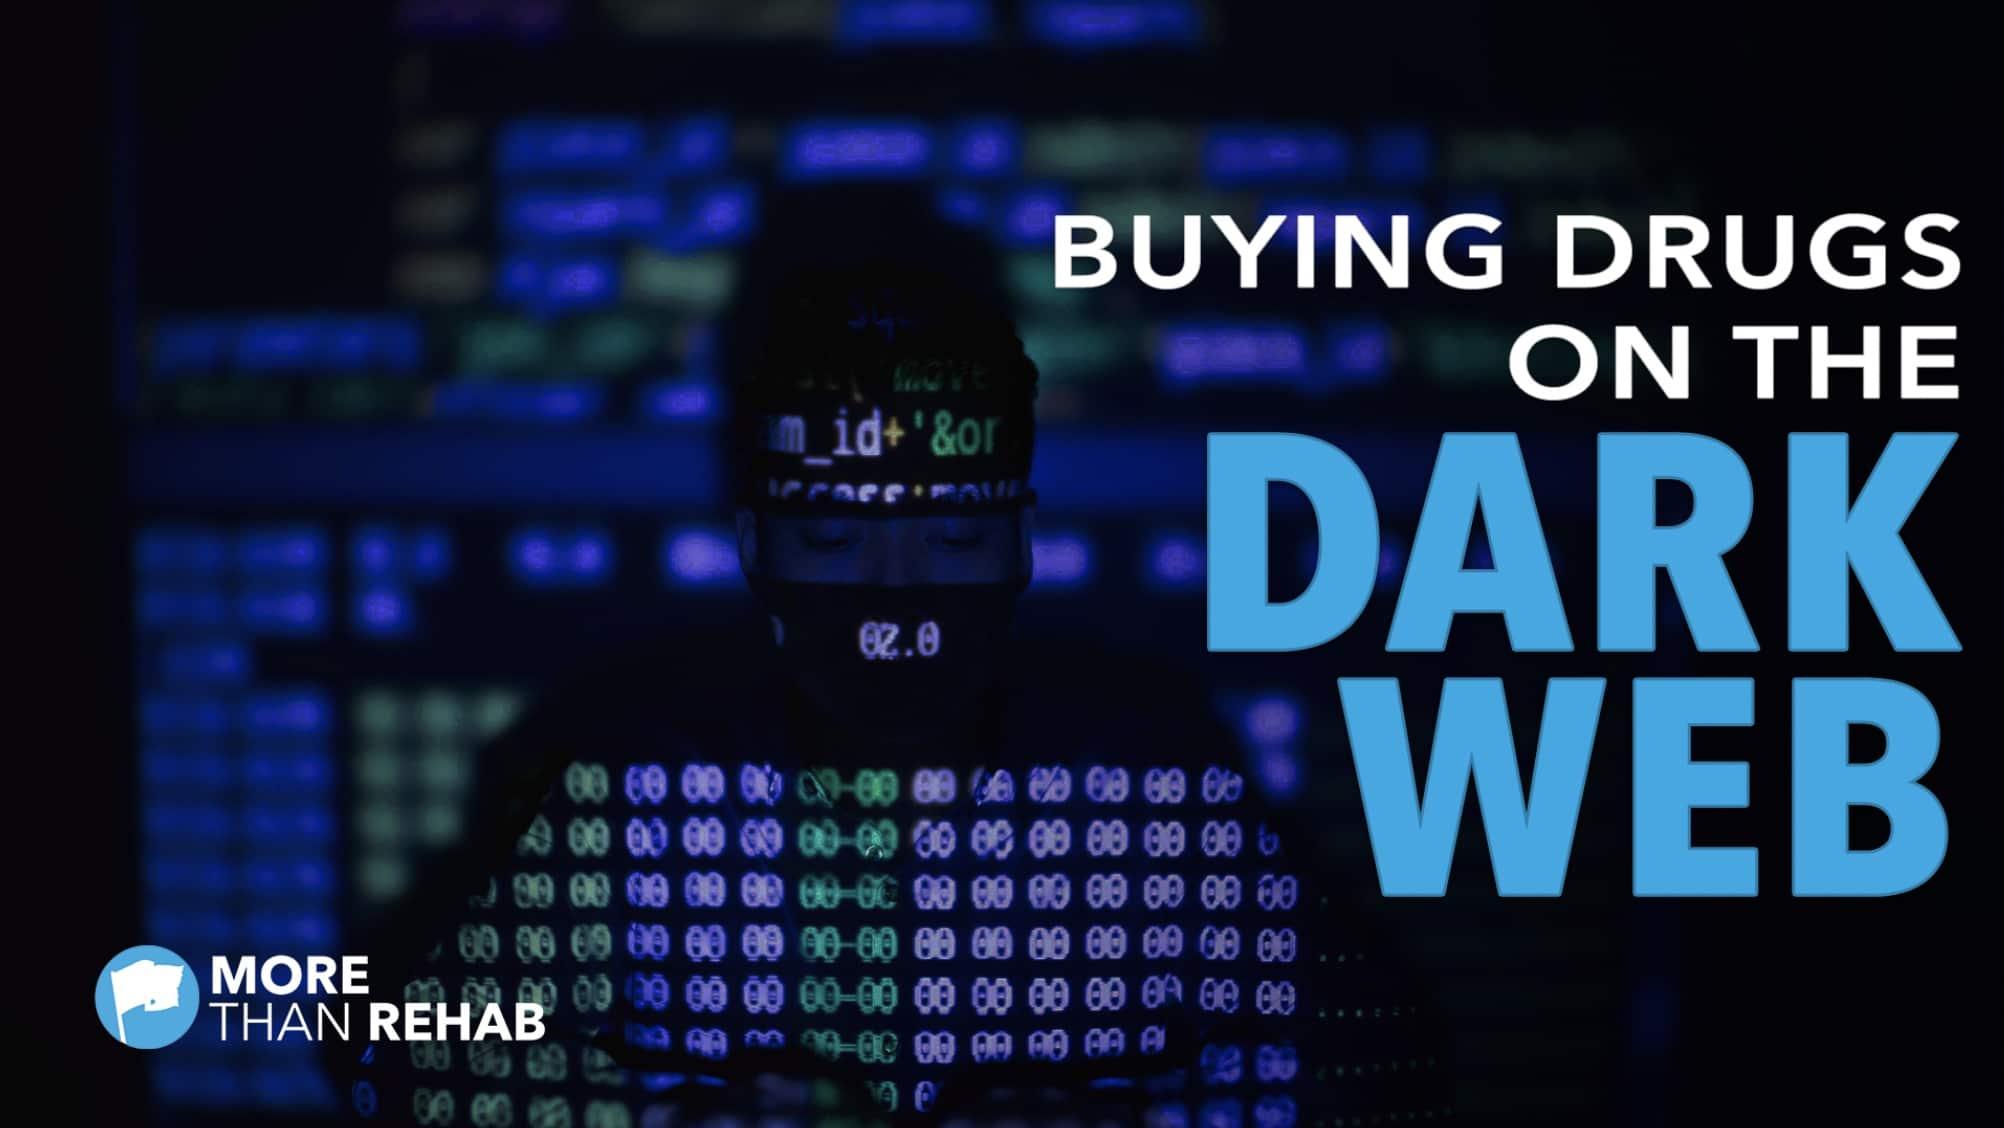 easy-to-buy-drugs-on-the-dark-web-deep-internet-illegal-drugs-Houston-Texas-area-drug-rehabilitation